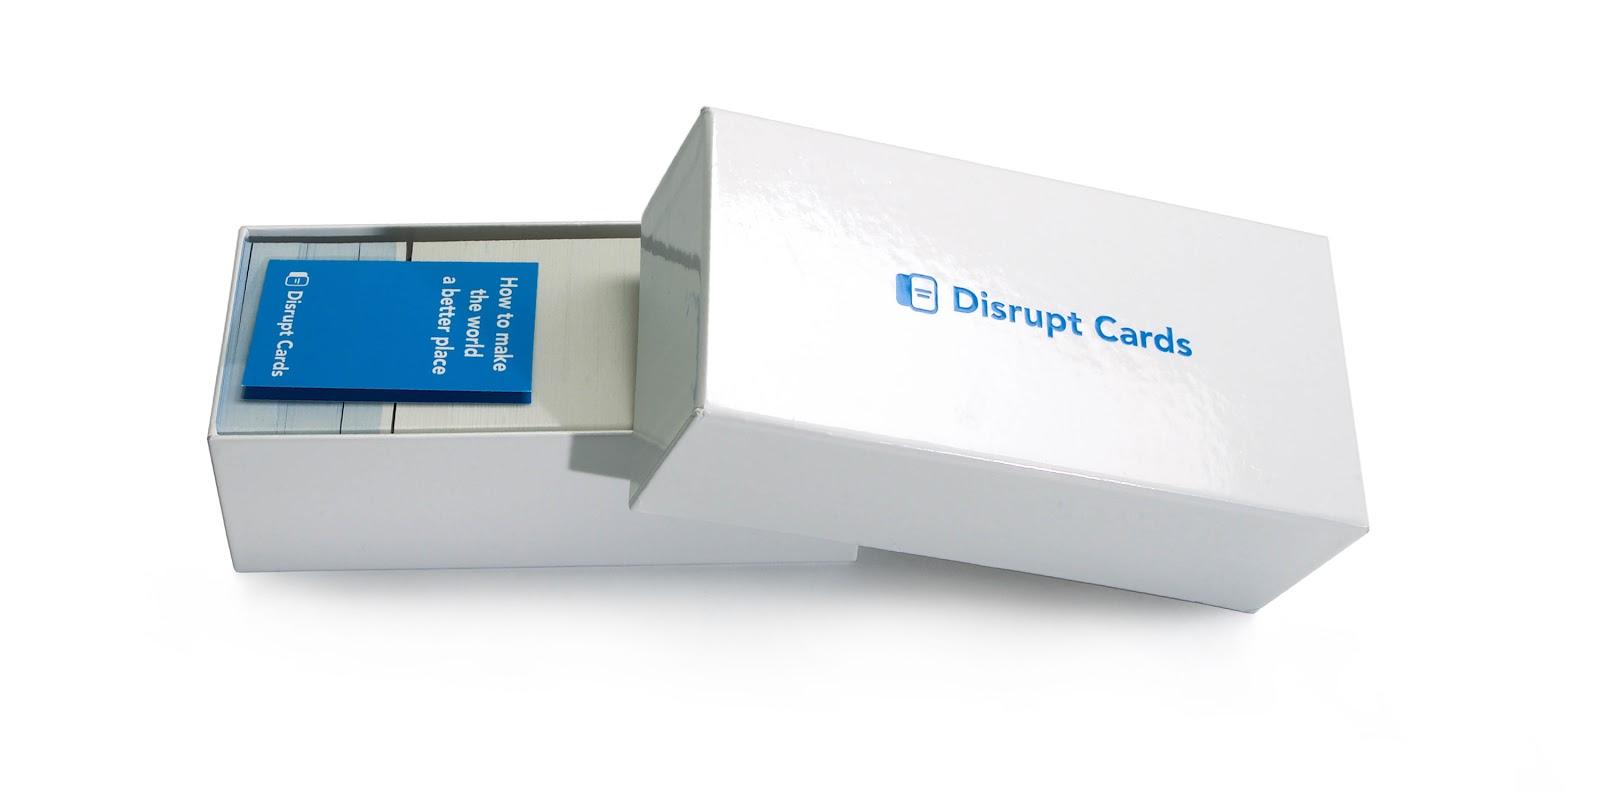 Disrupt Cards